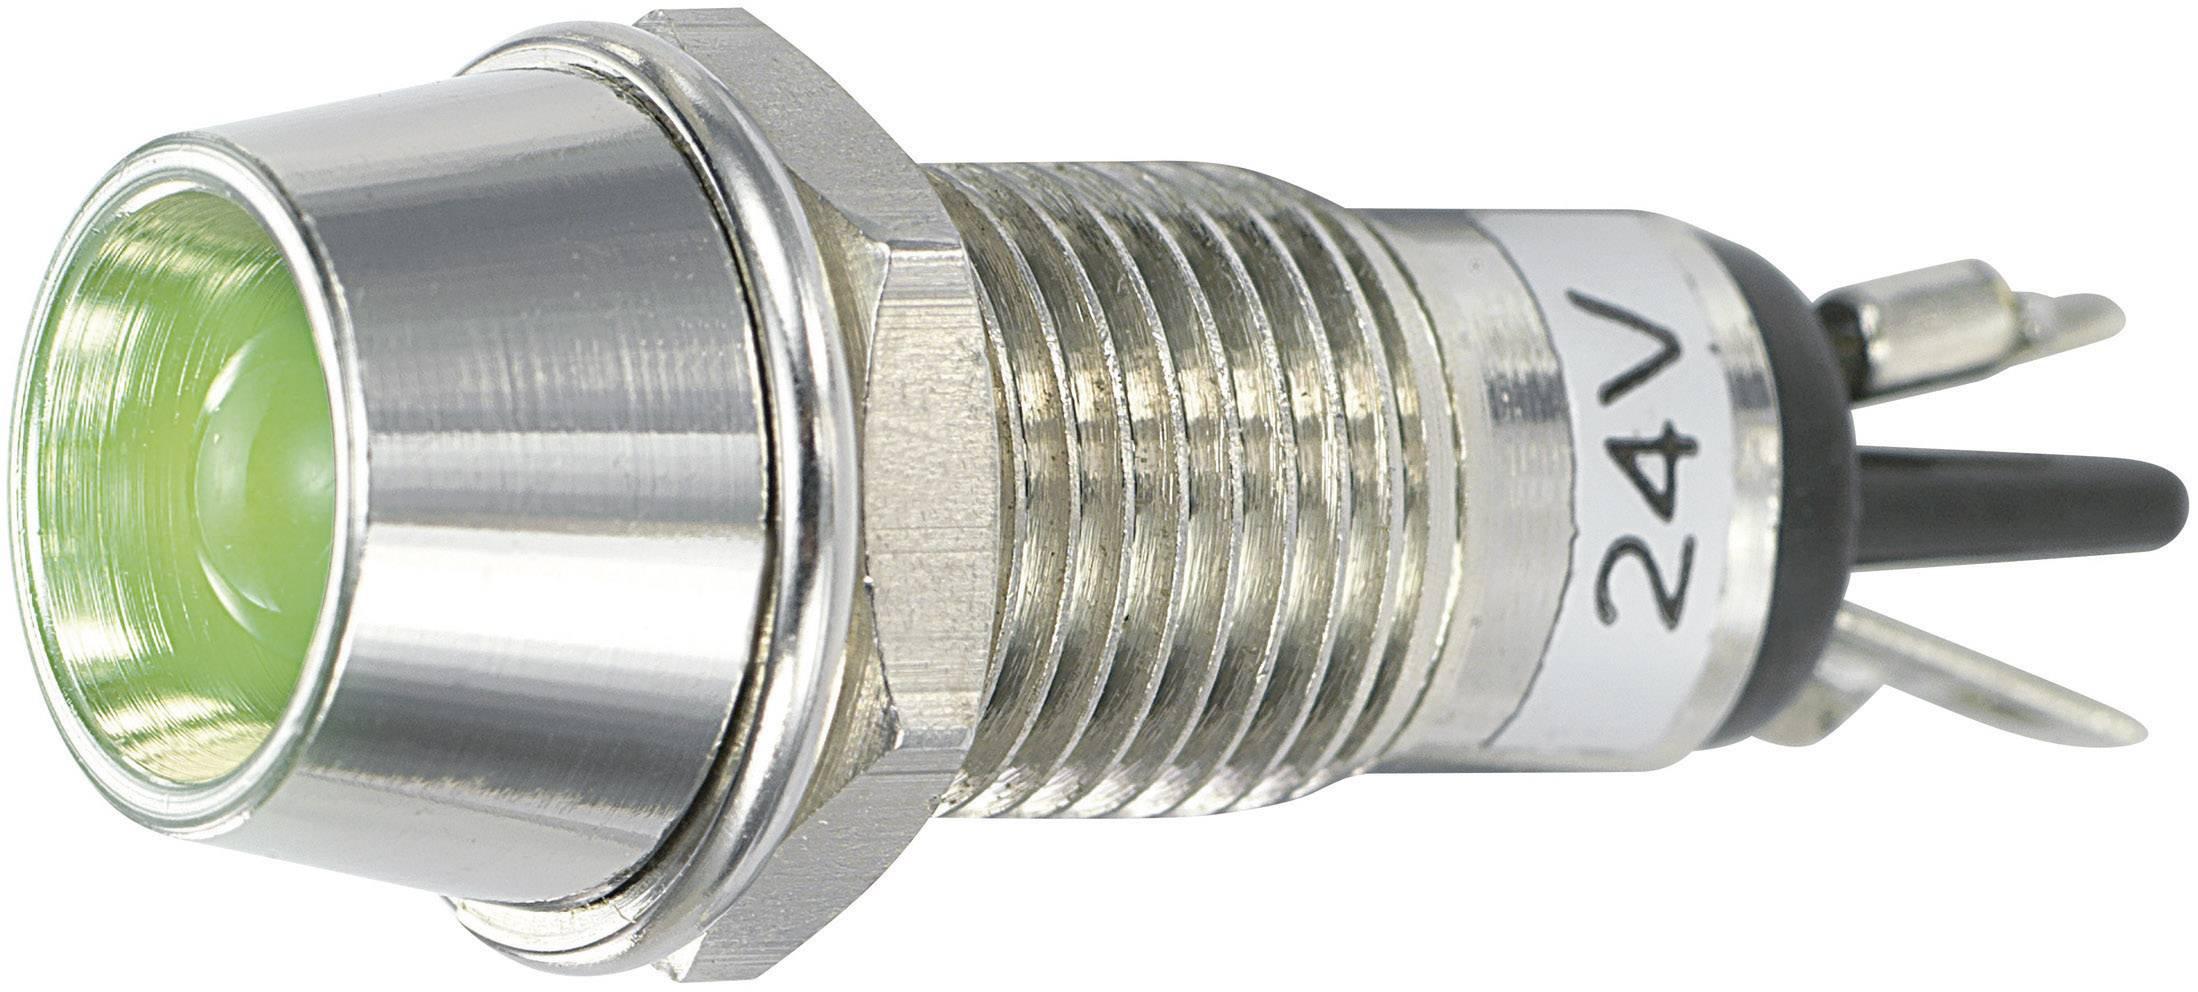 IndikačnéLED SCI R9-115L 24 V GREEN, 24 V/DC, zelená